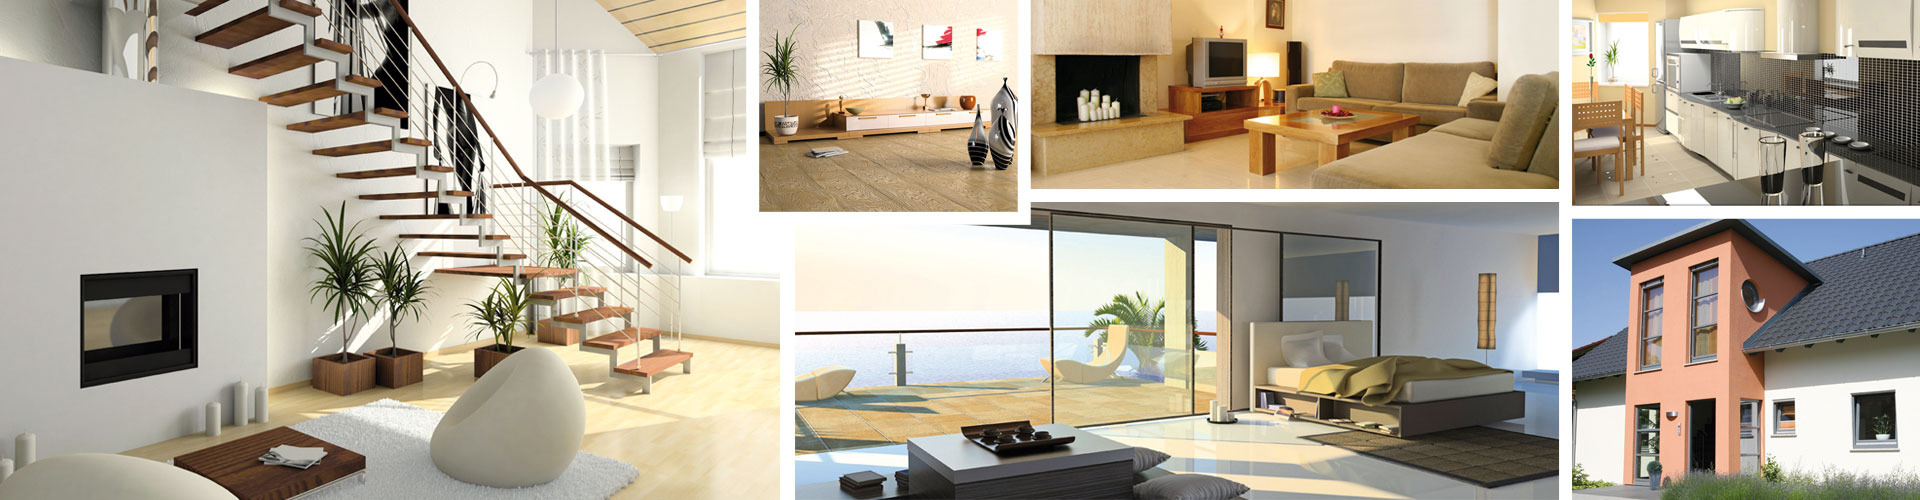 immobilienmakler in erkrath d sseldorf hilden schwarze immobilien. Black Bedroom Furniture Sets. Home Design Ideas